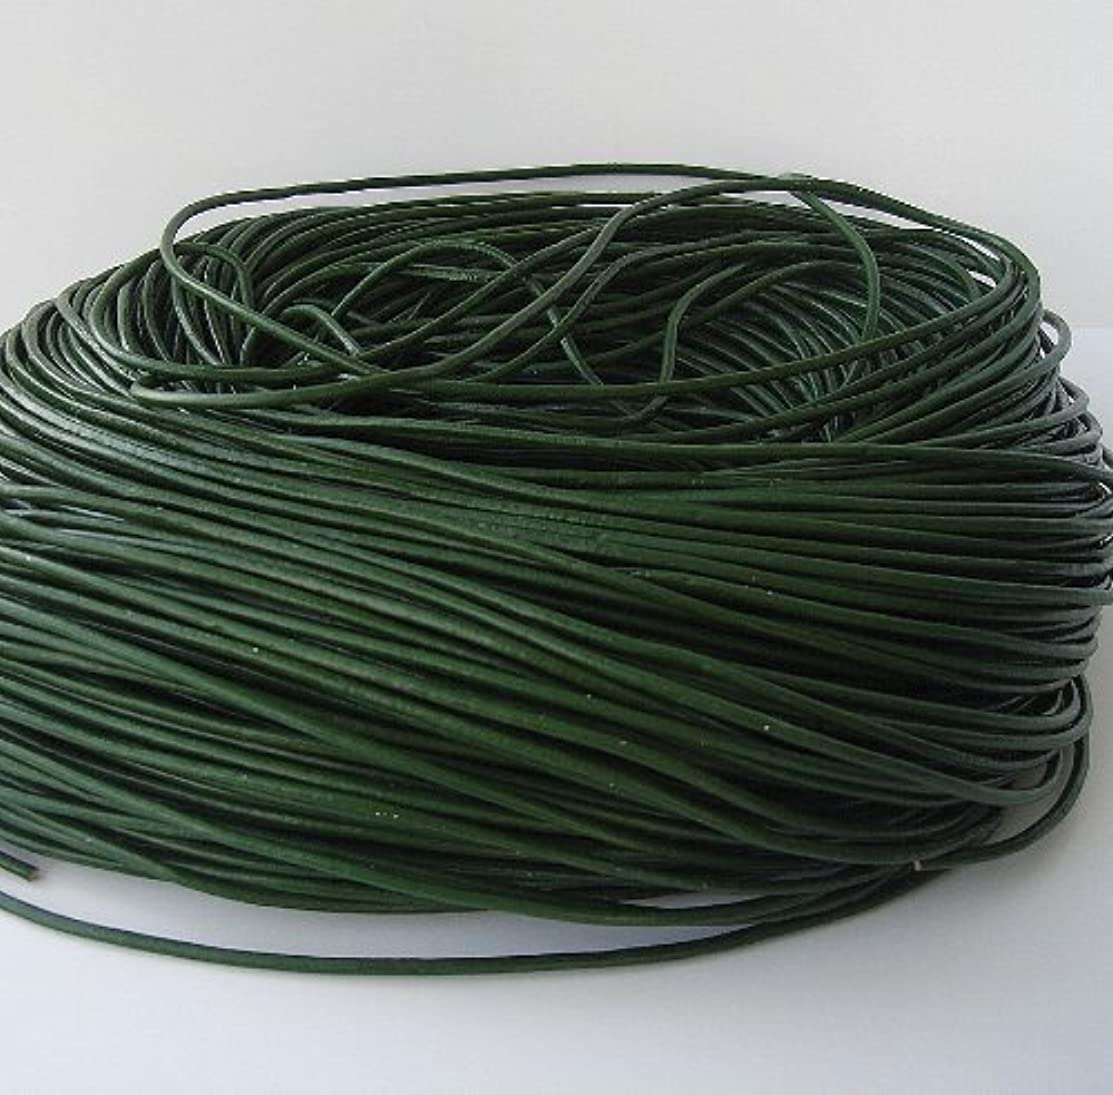 BeadsTreasure 15 Ft of Dark Green Genuine Leather Cord Round 2 mm Diameter.